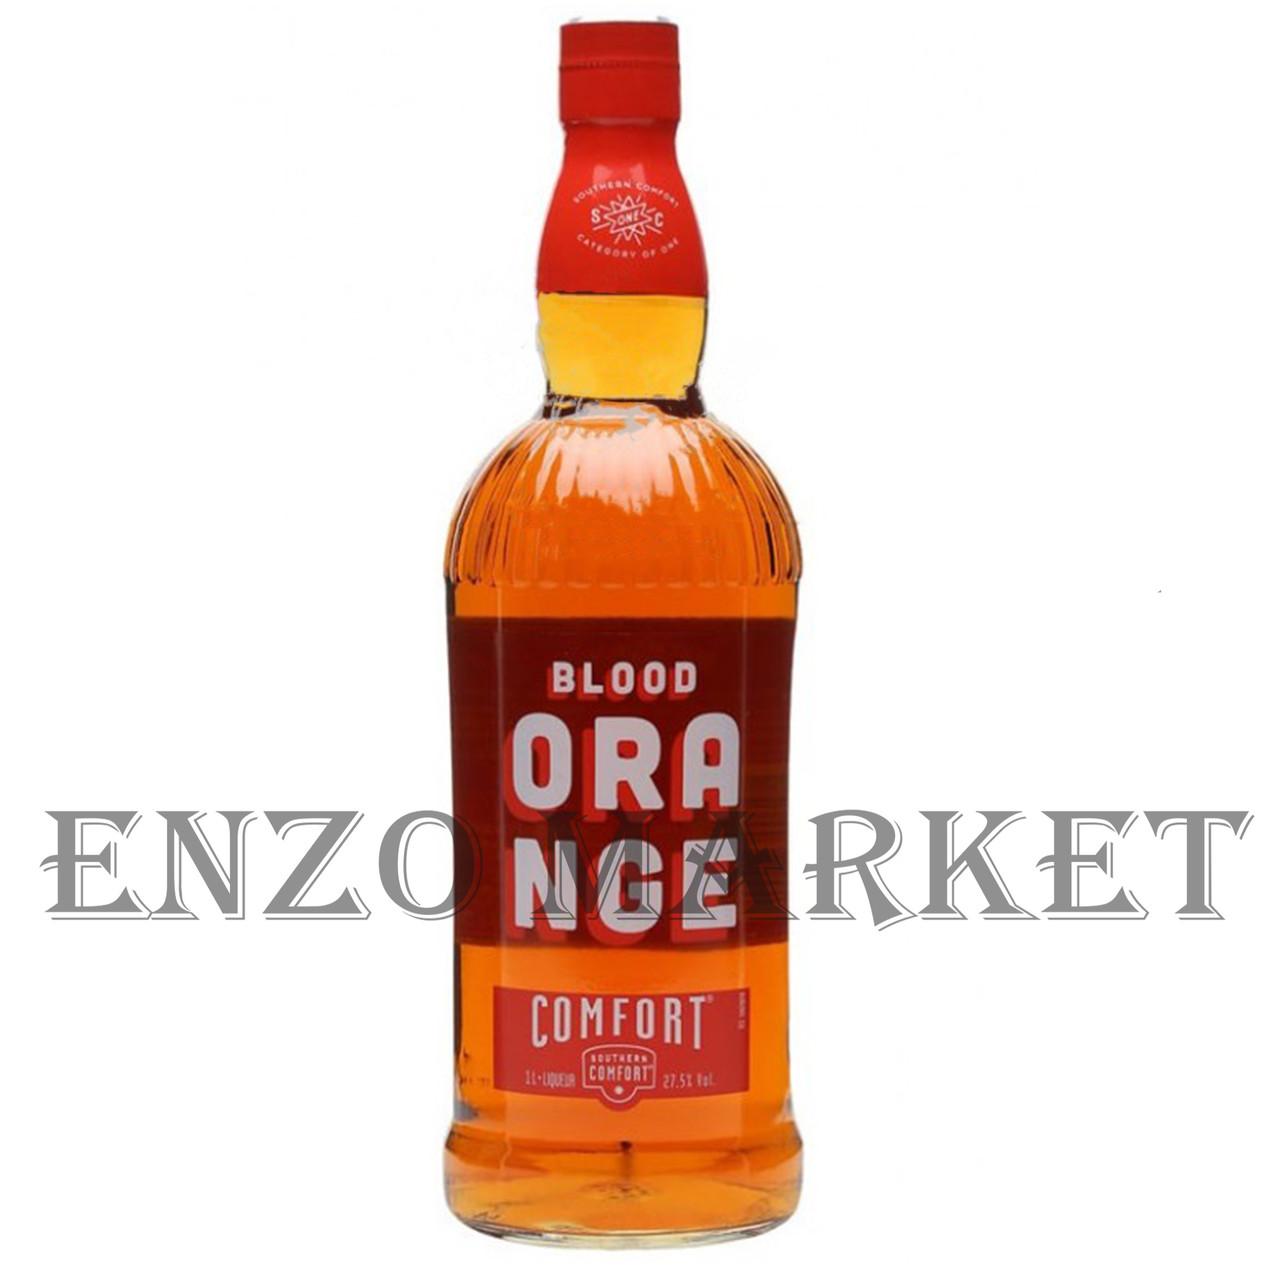 Ликер Southern Comfort Blood Orange (Саузен Комфорт Блад Оранж) 27.5%, 1 литр